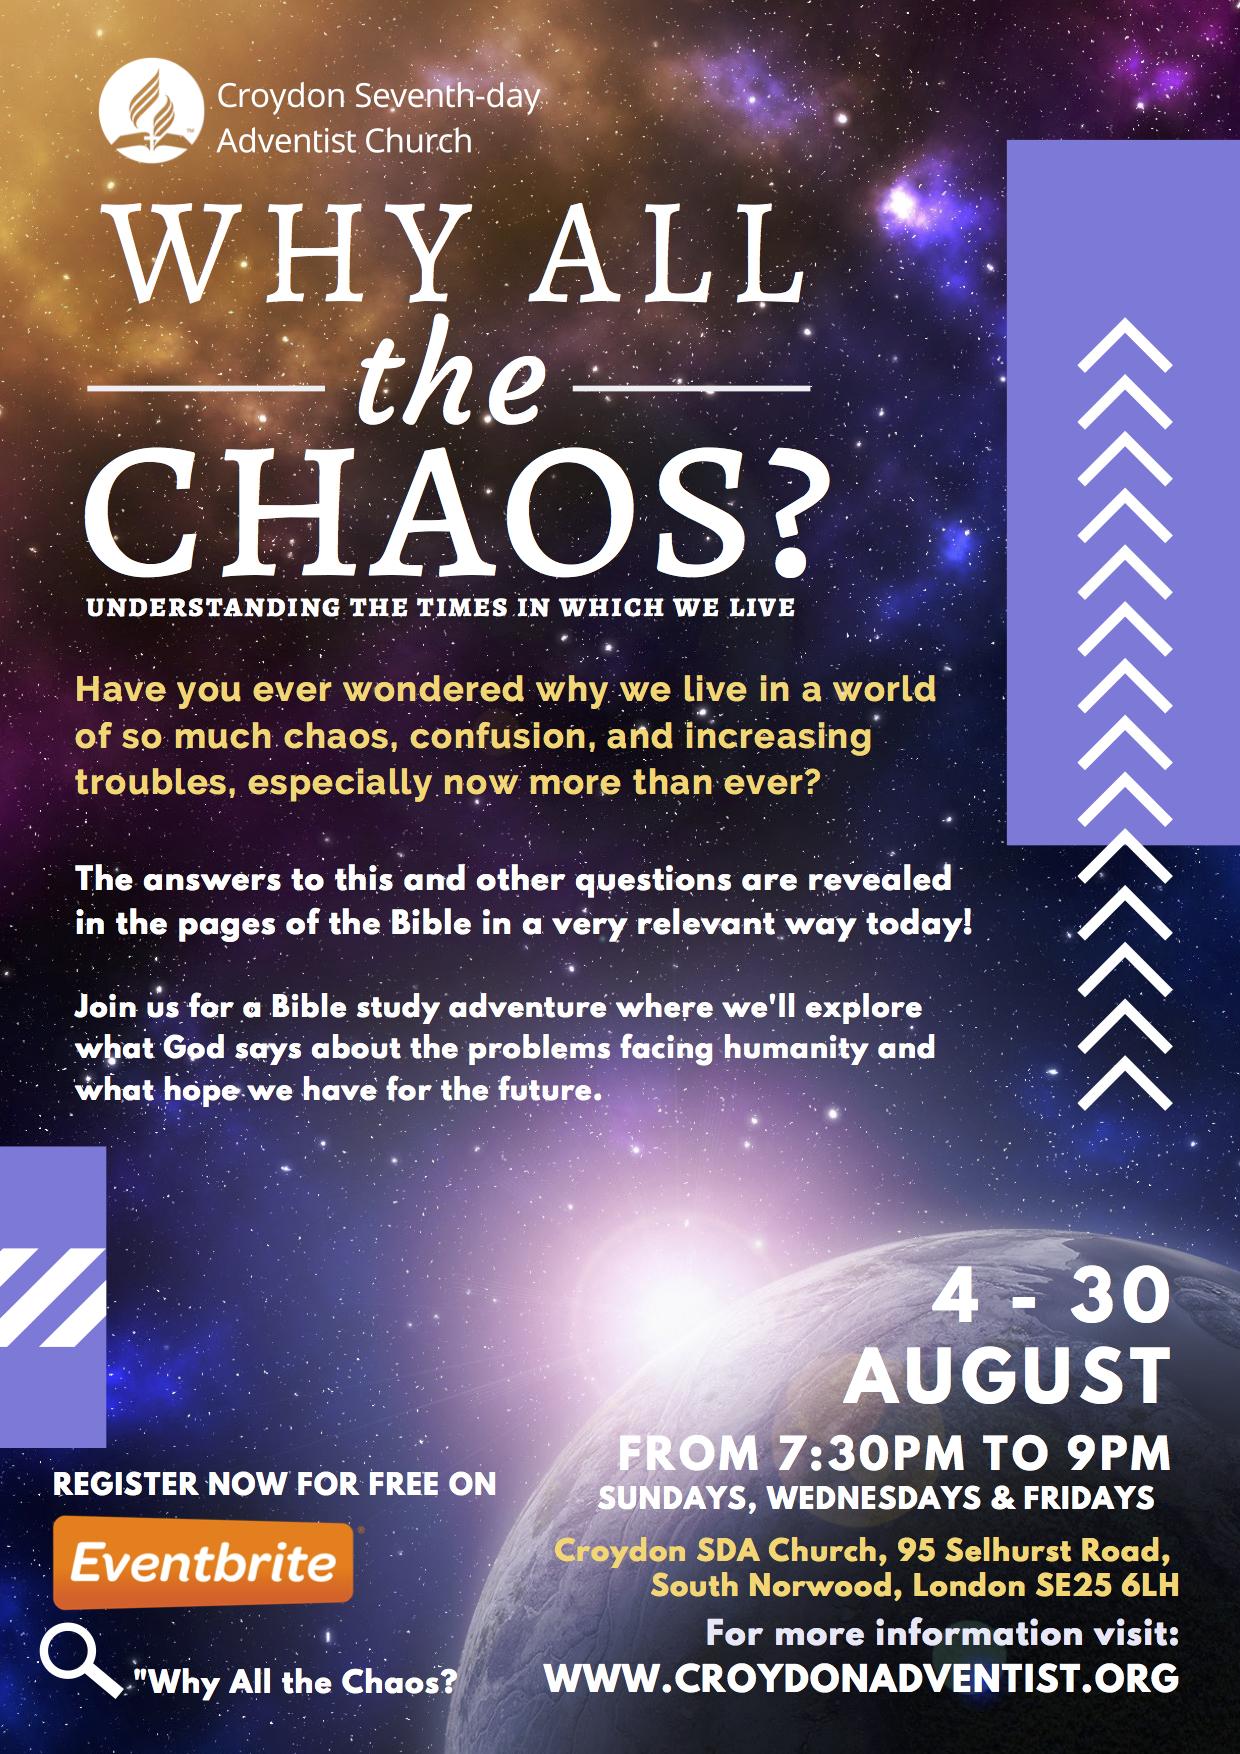 Why All the Chaos? Revelation Seminar – Croydon Seventh-day